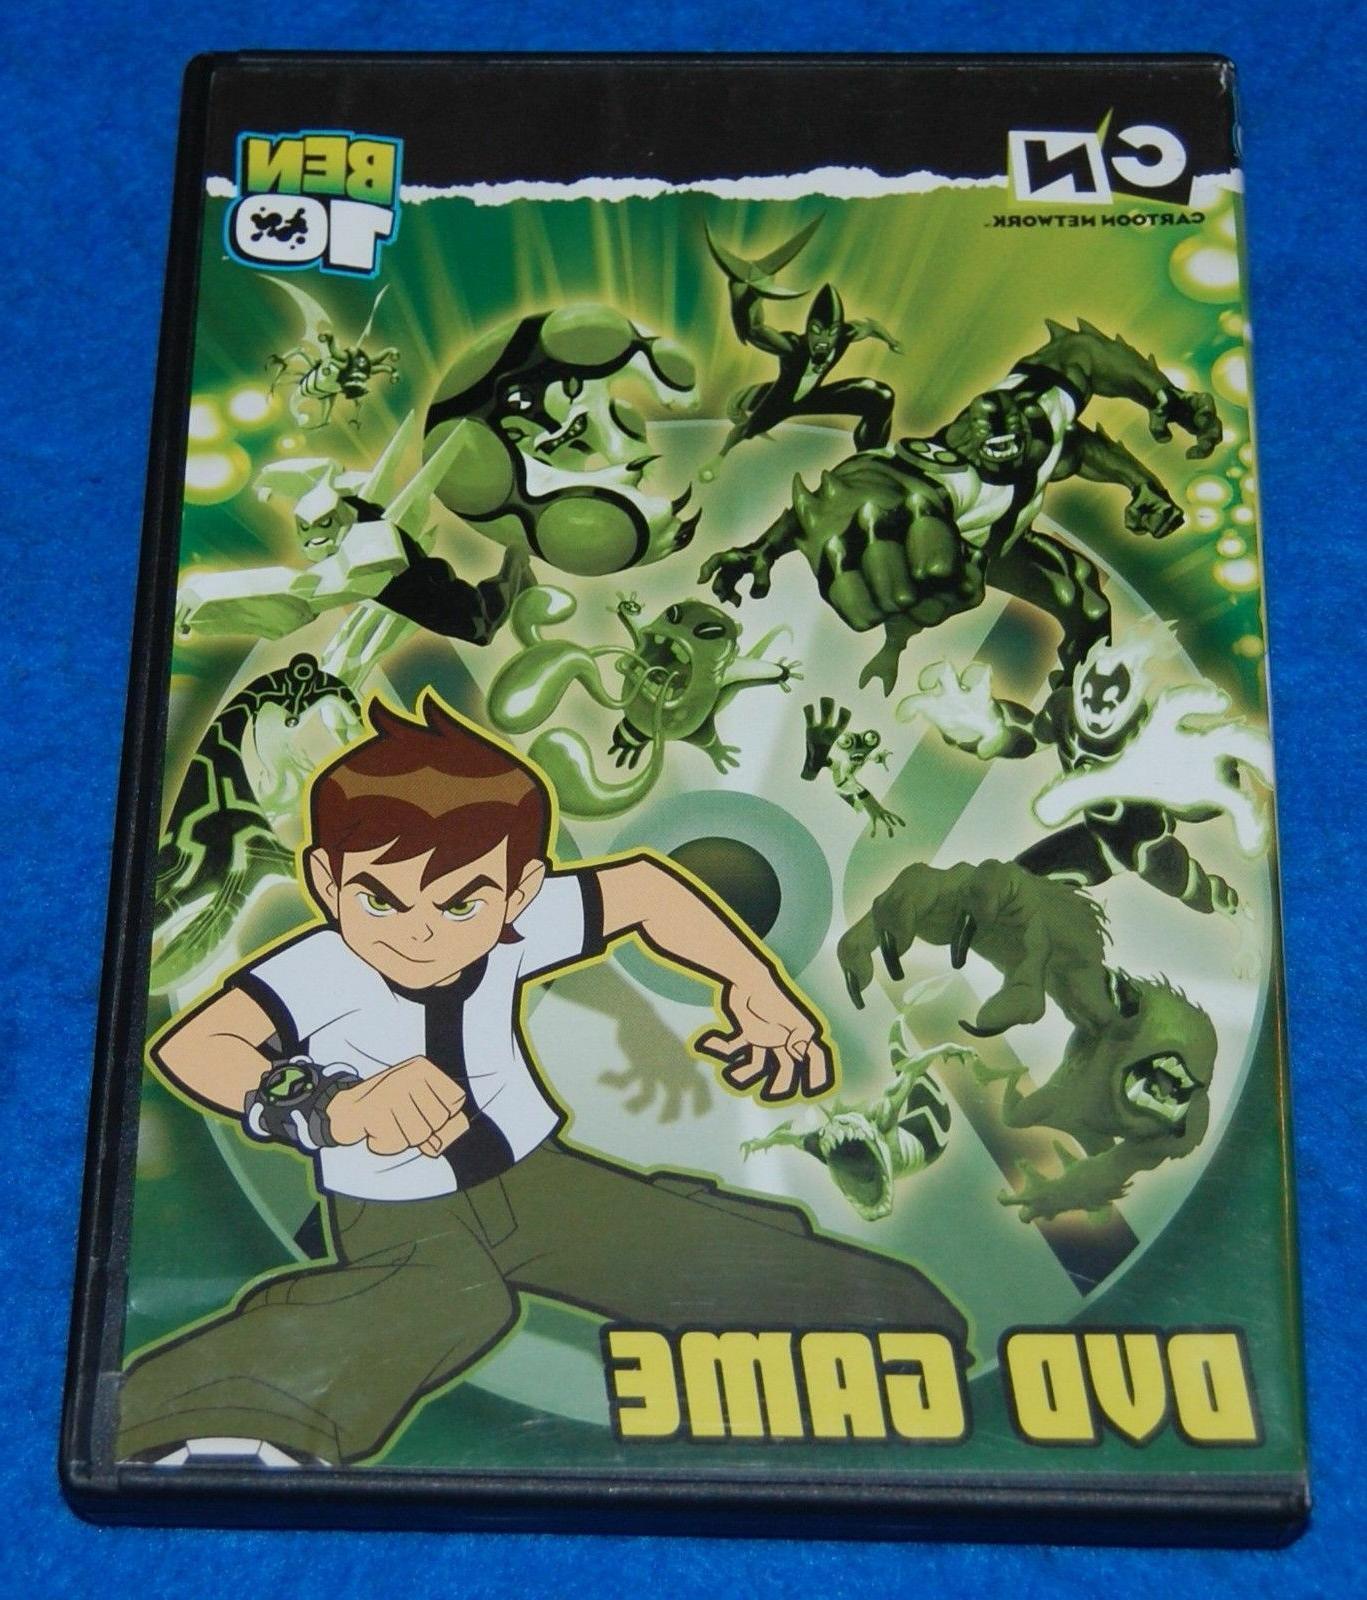 Ben Dvd Cartoon players Kids And Game